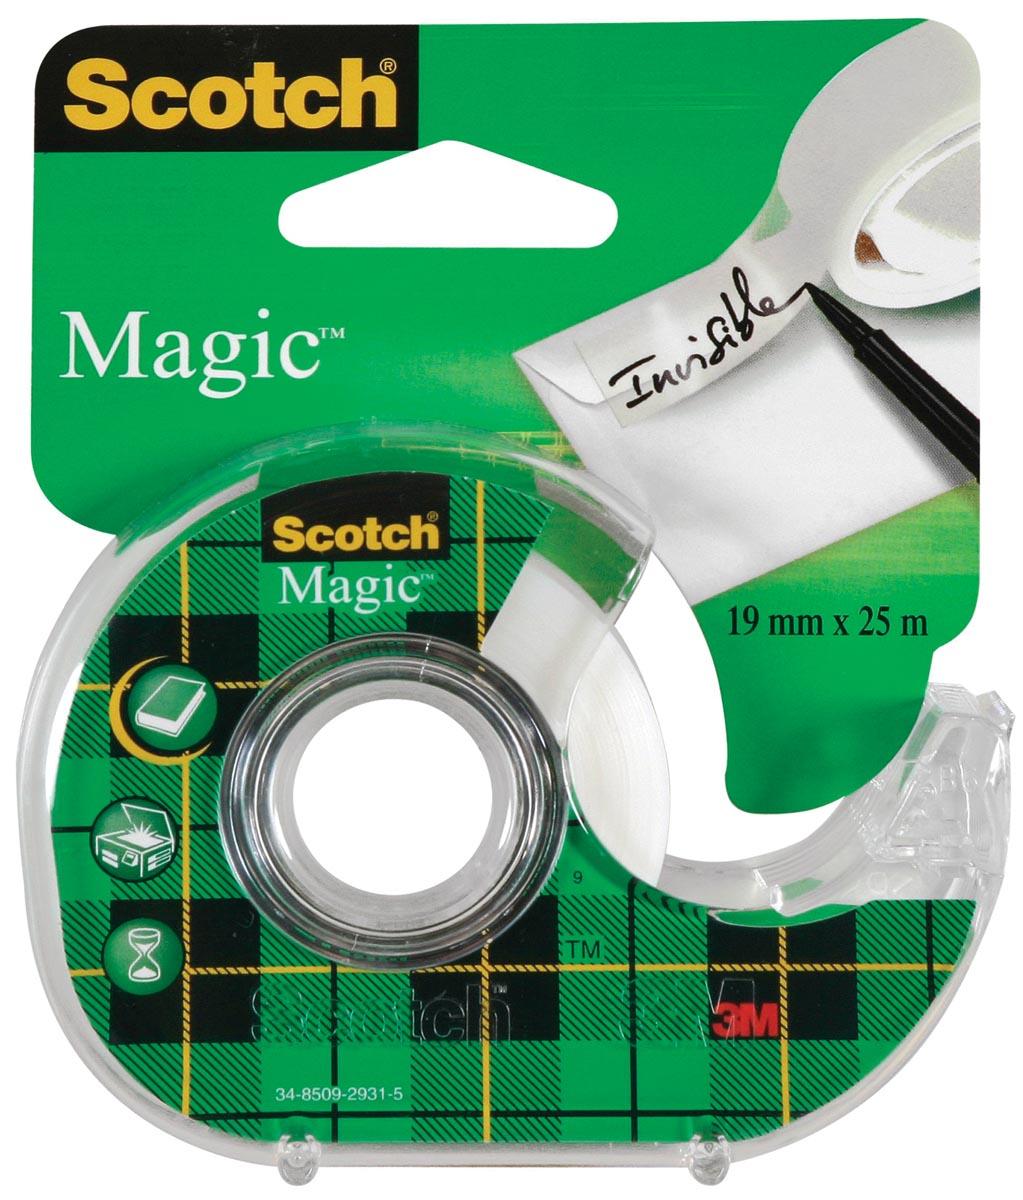 Scotch plakband Magic Tape ft 19 mm x 25 m, blister met dispenser en 1 rolletje